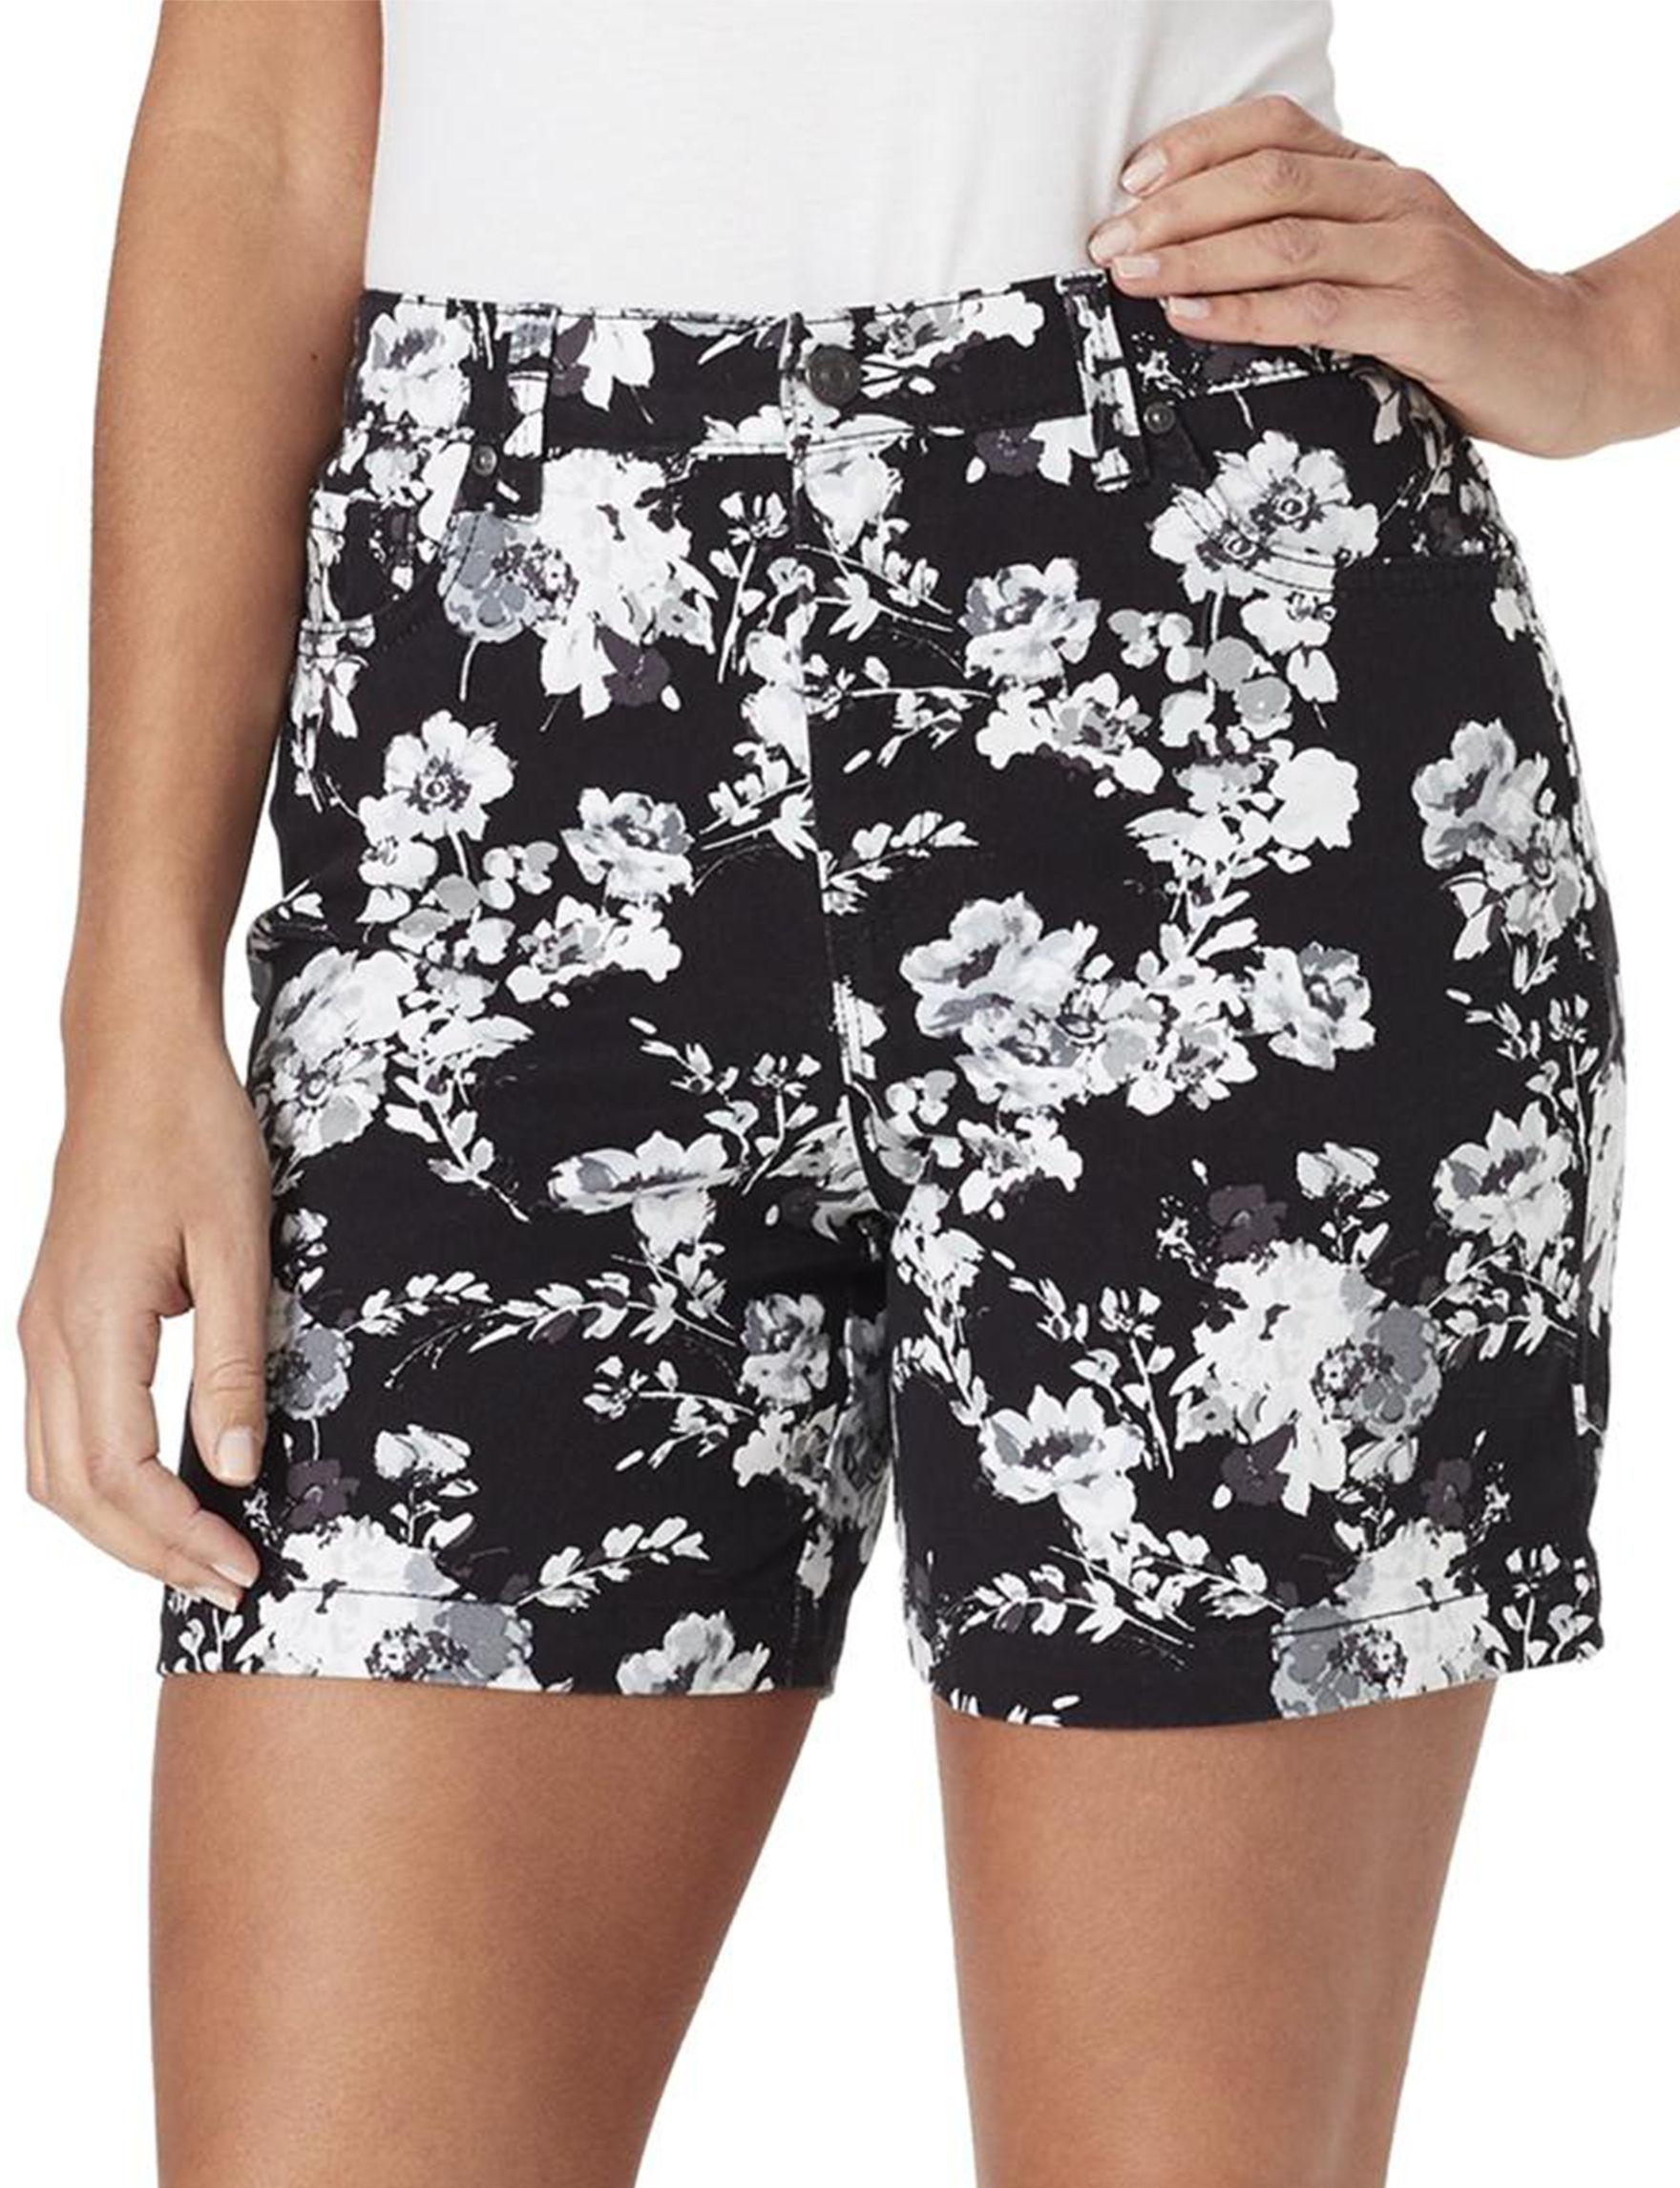 Gloria Vanderbilt Black /  White Tailored Shorts